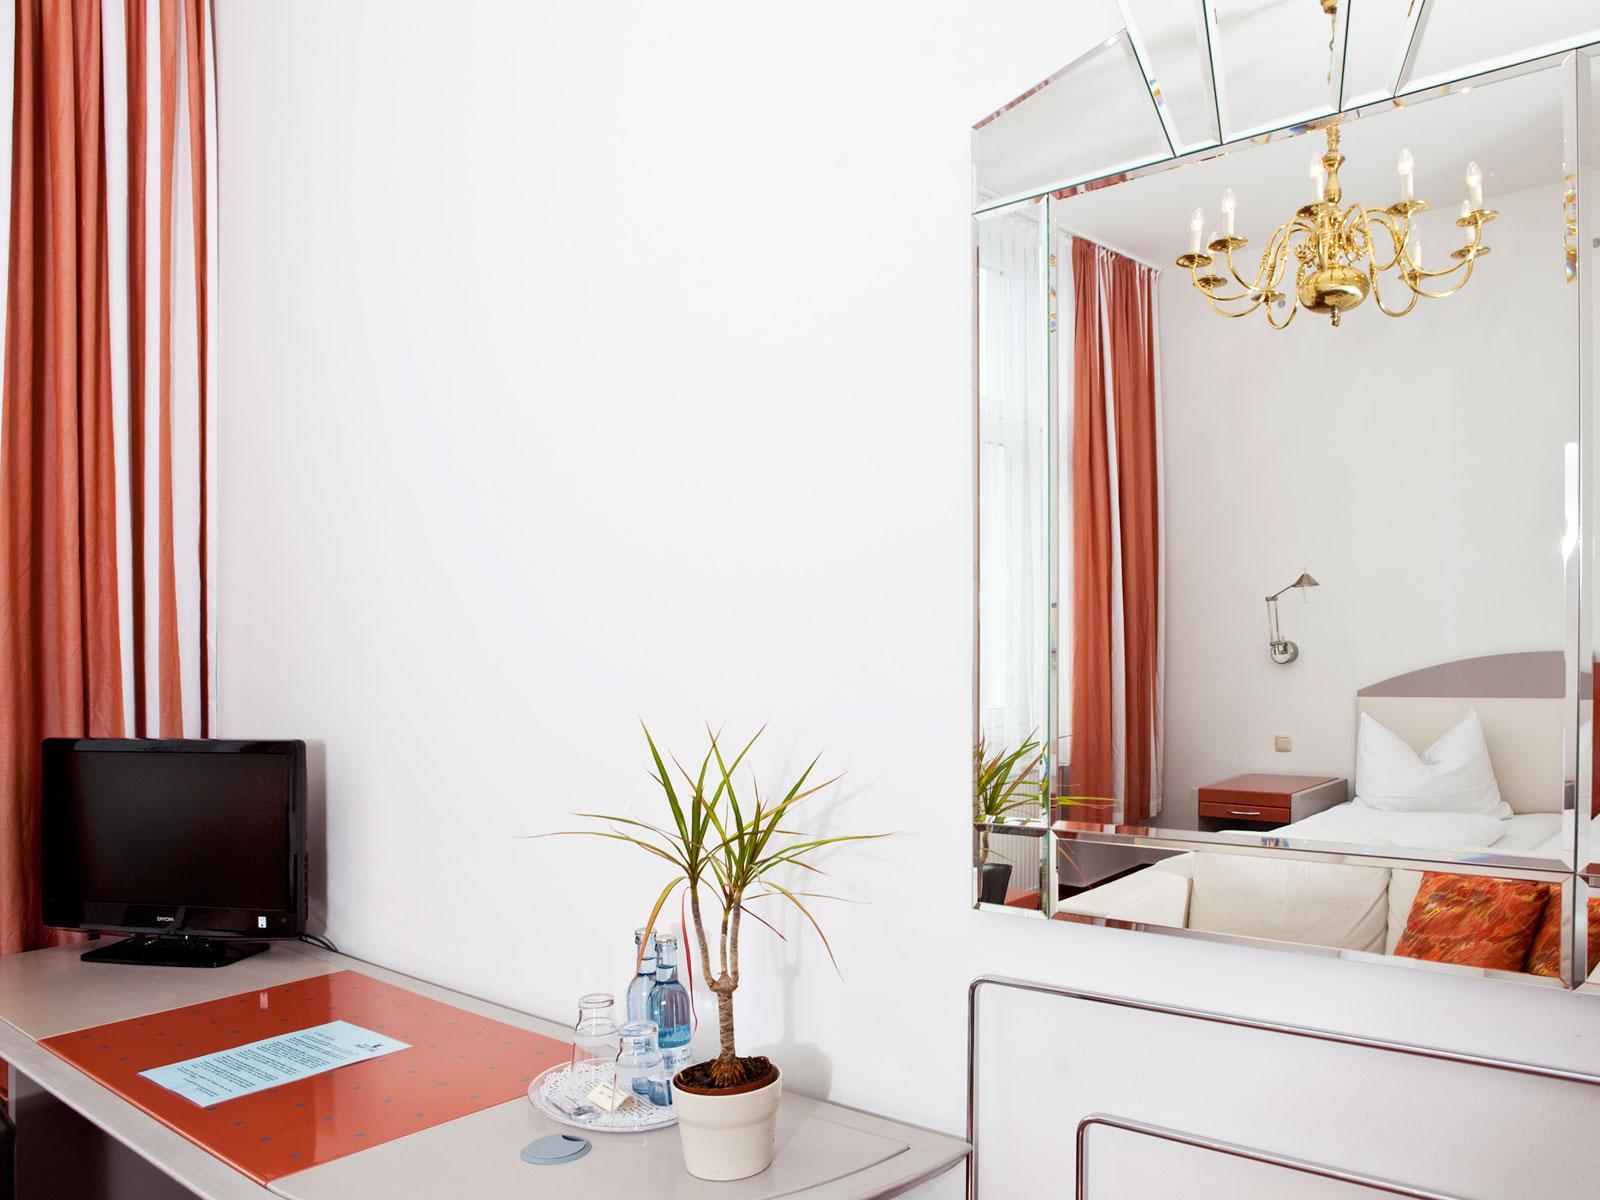 abl/hotel-adler-garni-greifswald-doppelzimmer.jpg